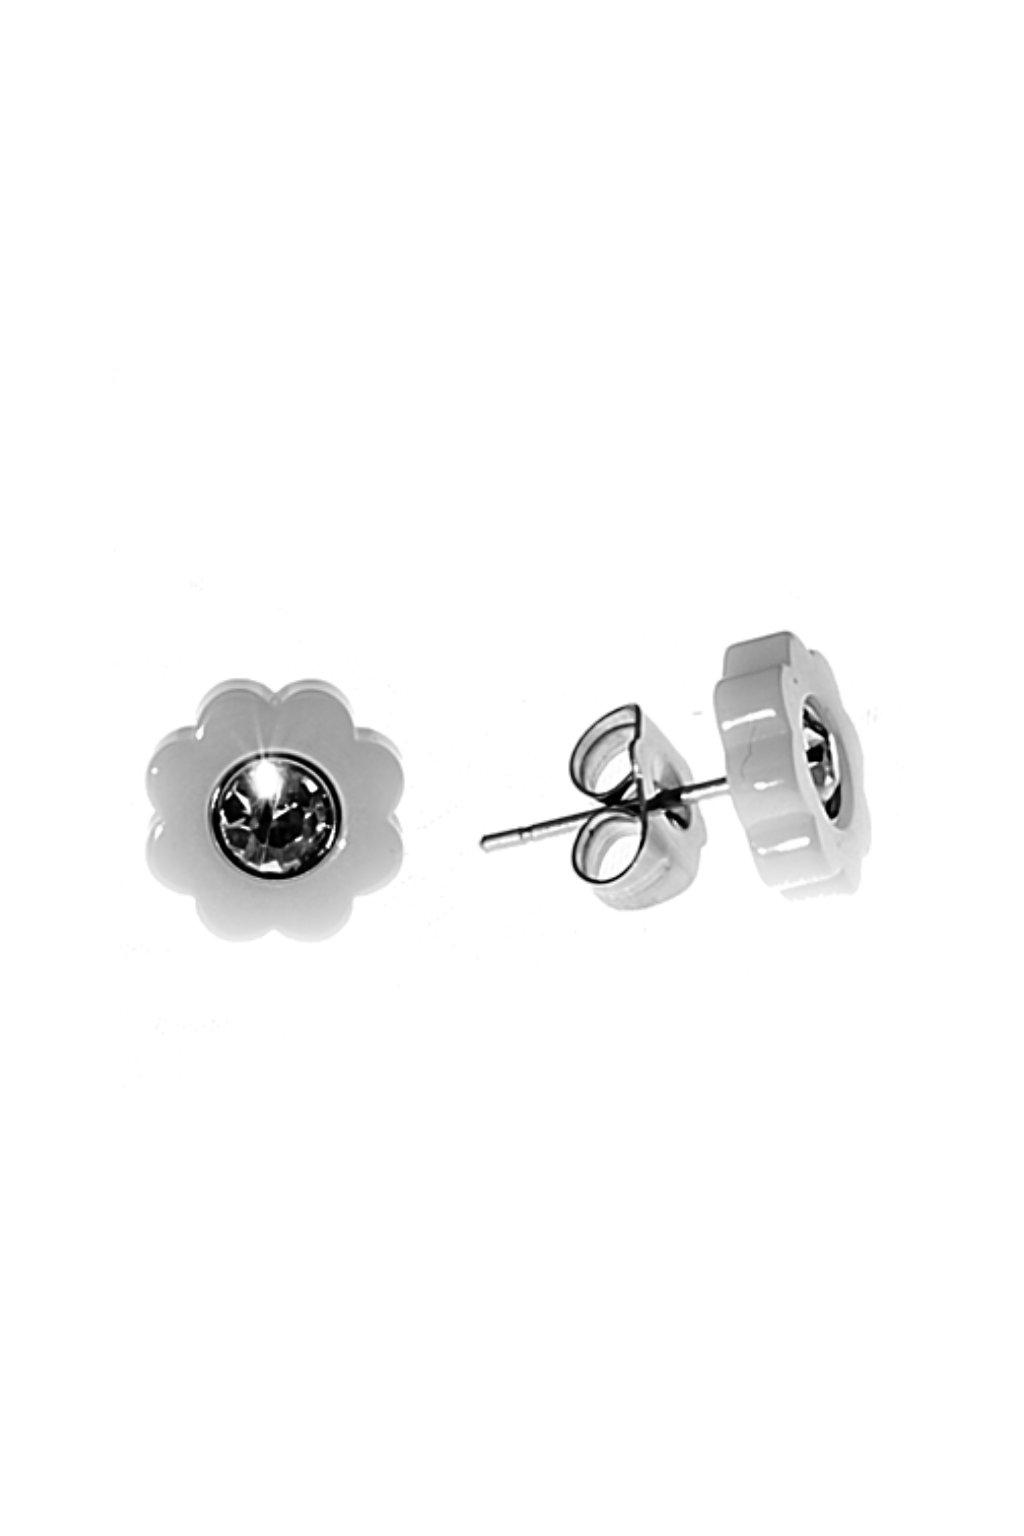 Skalimar Náušnice z chirurgické oceli KERAMICKÉ ŠTEKRY 41005704